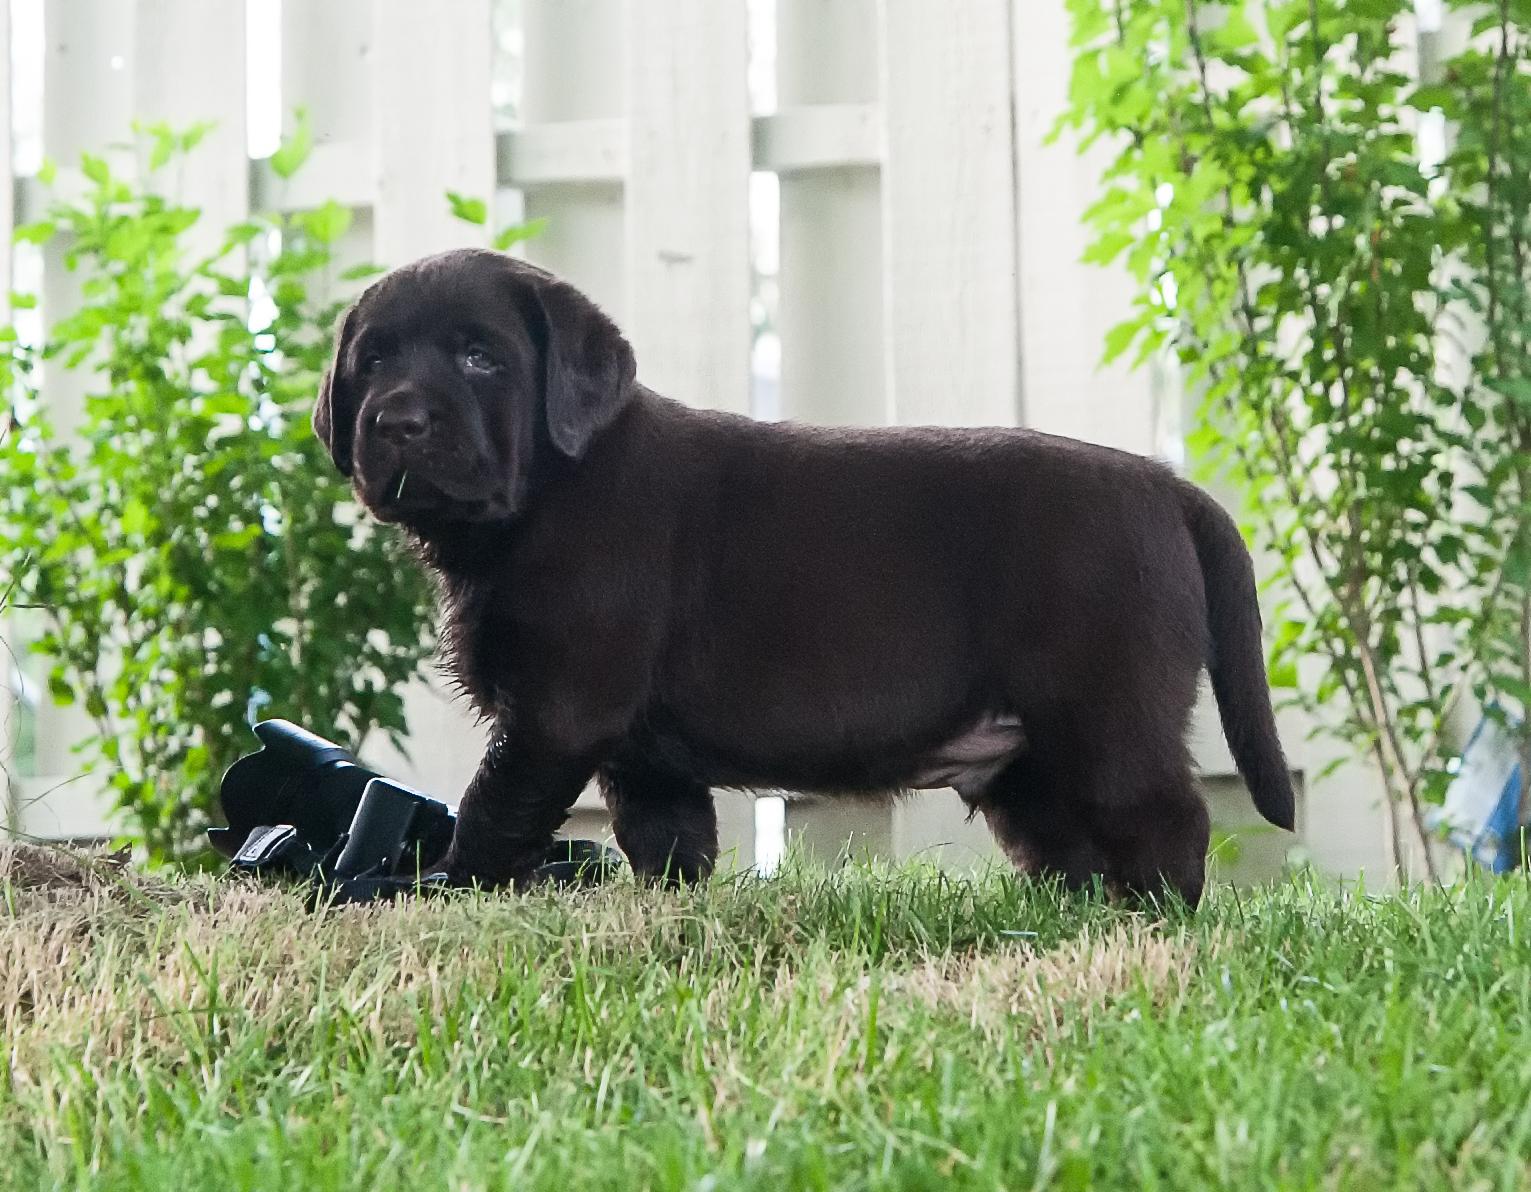 The special boy puppy   June 24 2012.jpg